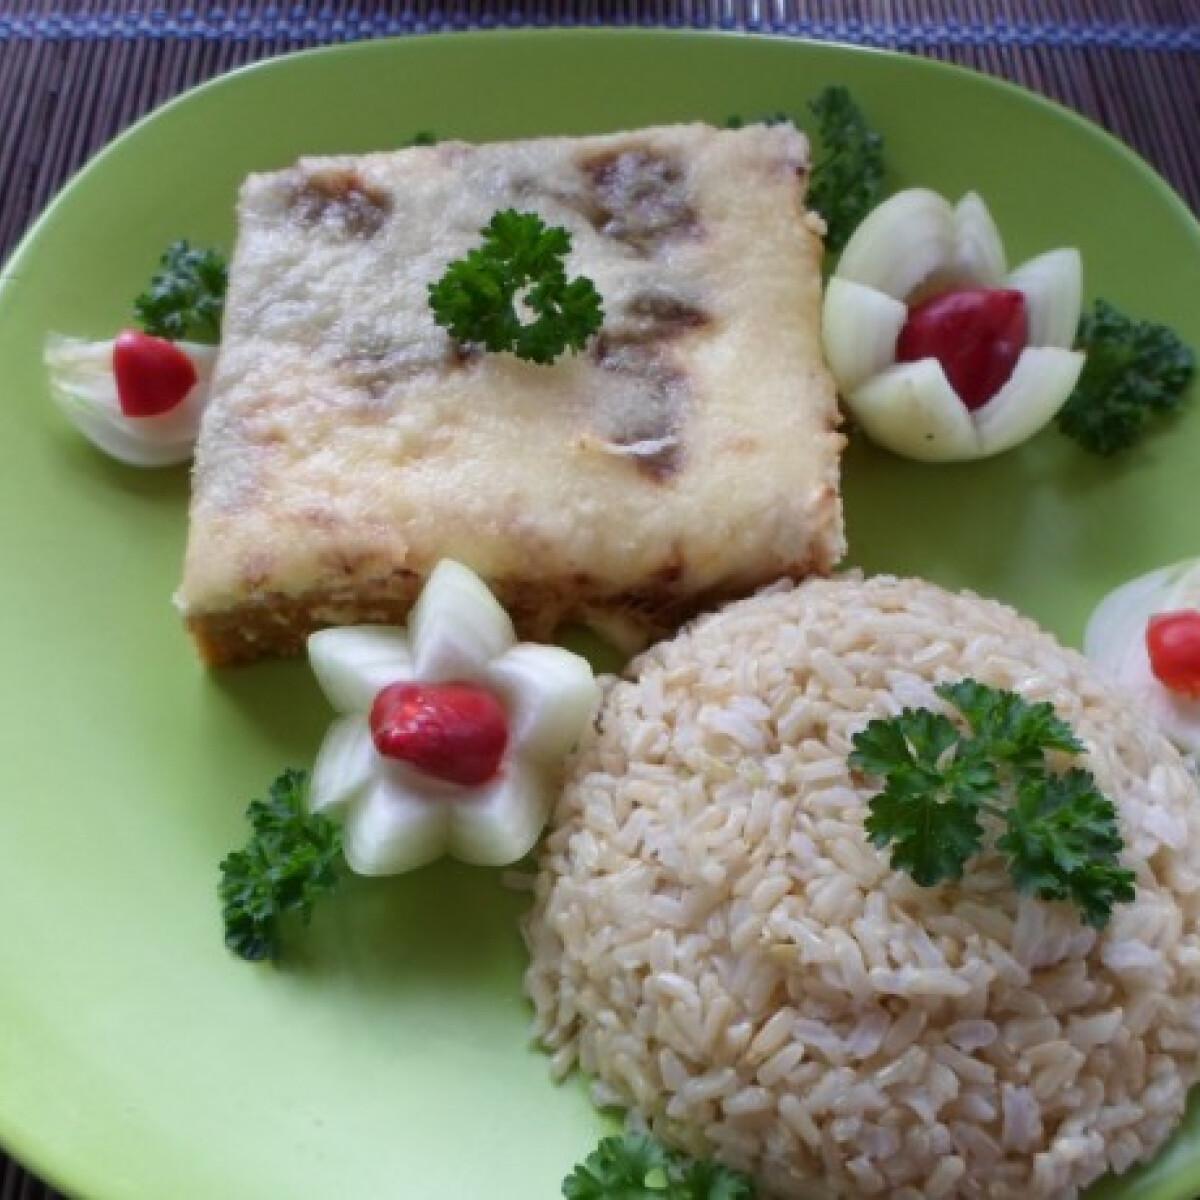 Sajtos-tejfölös tepsis fasírt